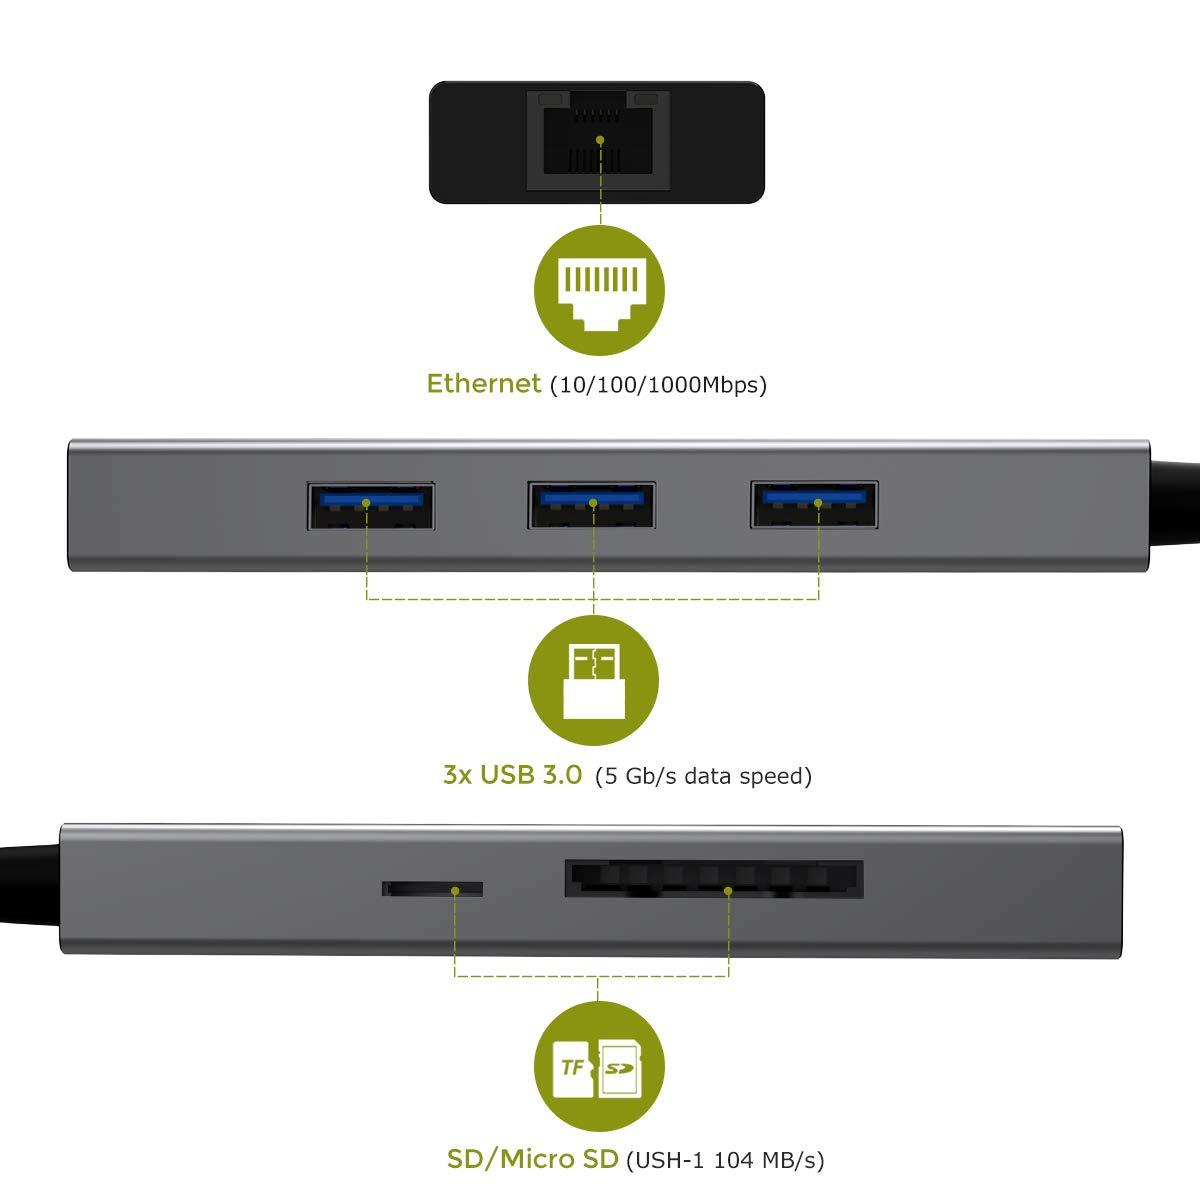 Thunderbolt 3 40 Gbps,alimentaci/ón USB-C,SD y Micro SD//TF gris Hub USB C,Dongle Adaptador USB Hub USB-C para Macbook Pro 13 y 15 2016//2017,Hub tipo C con HDMI 2 USB 3.0 puertos para Macbook Pro